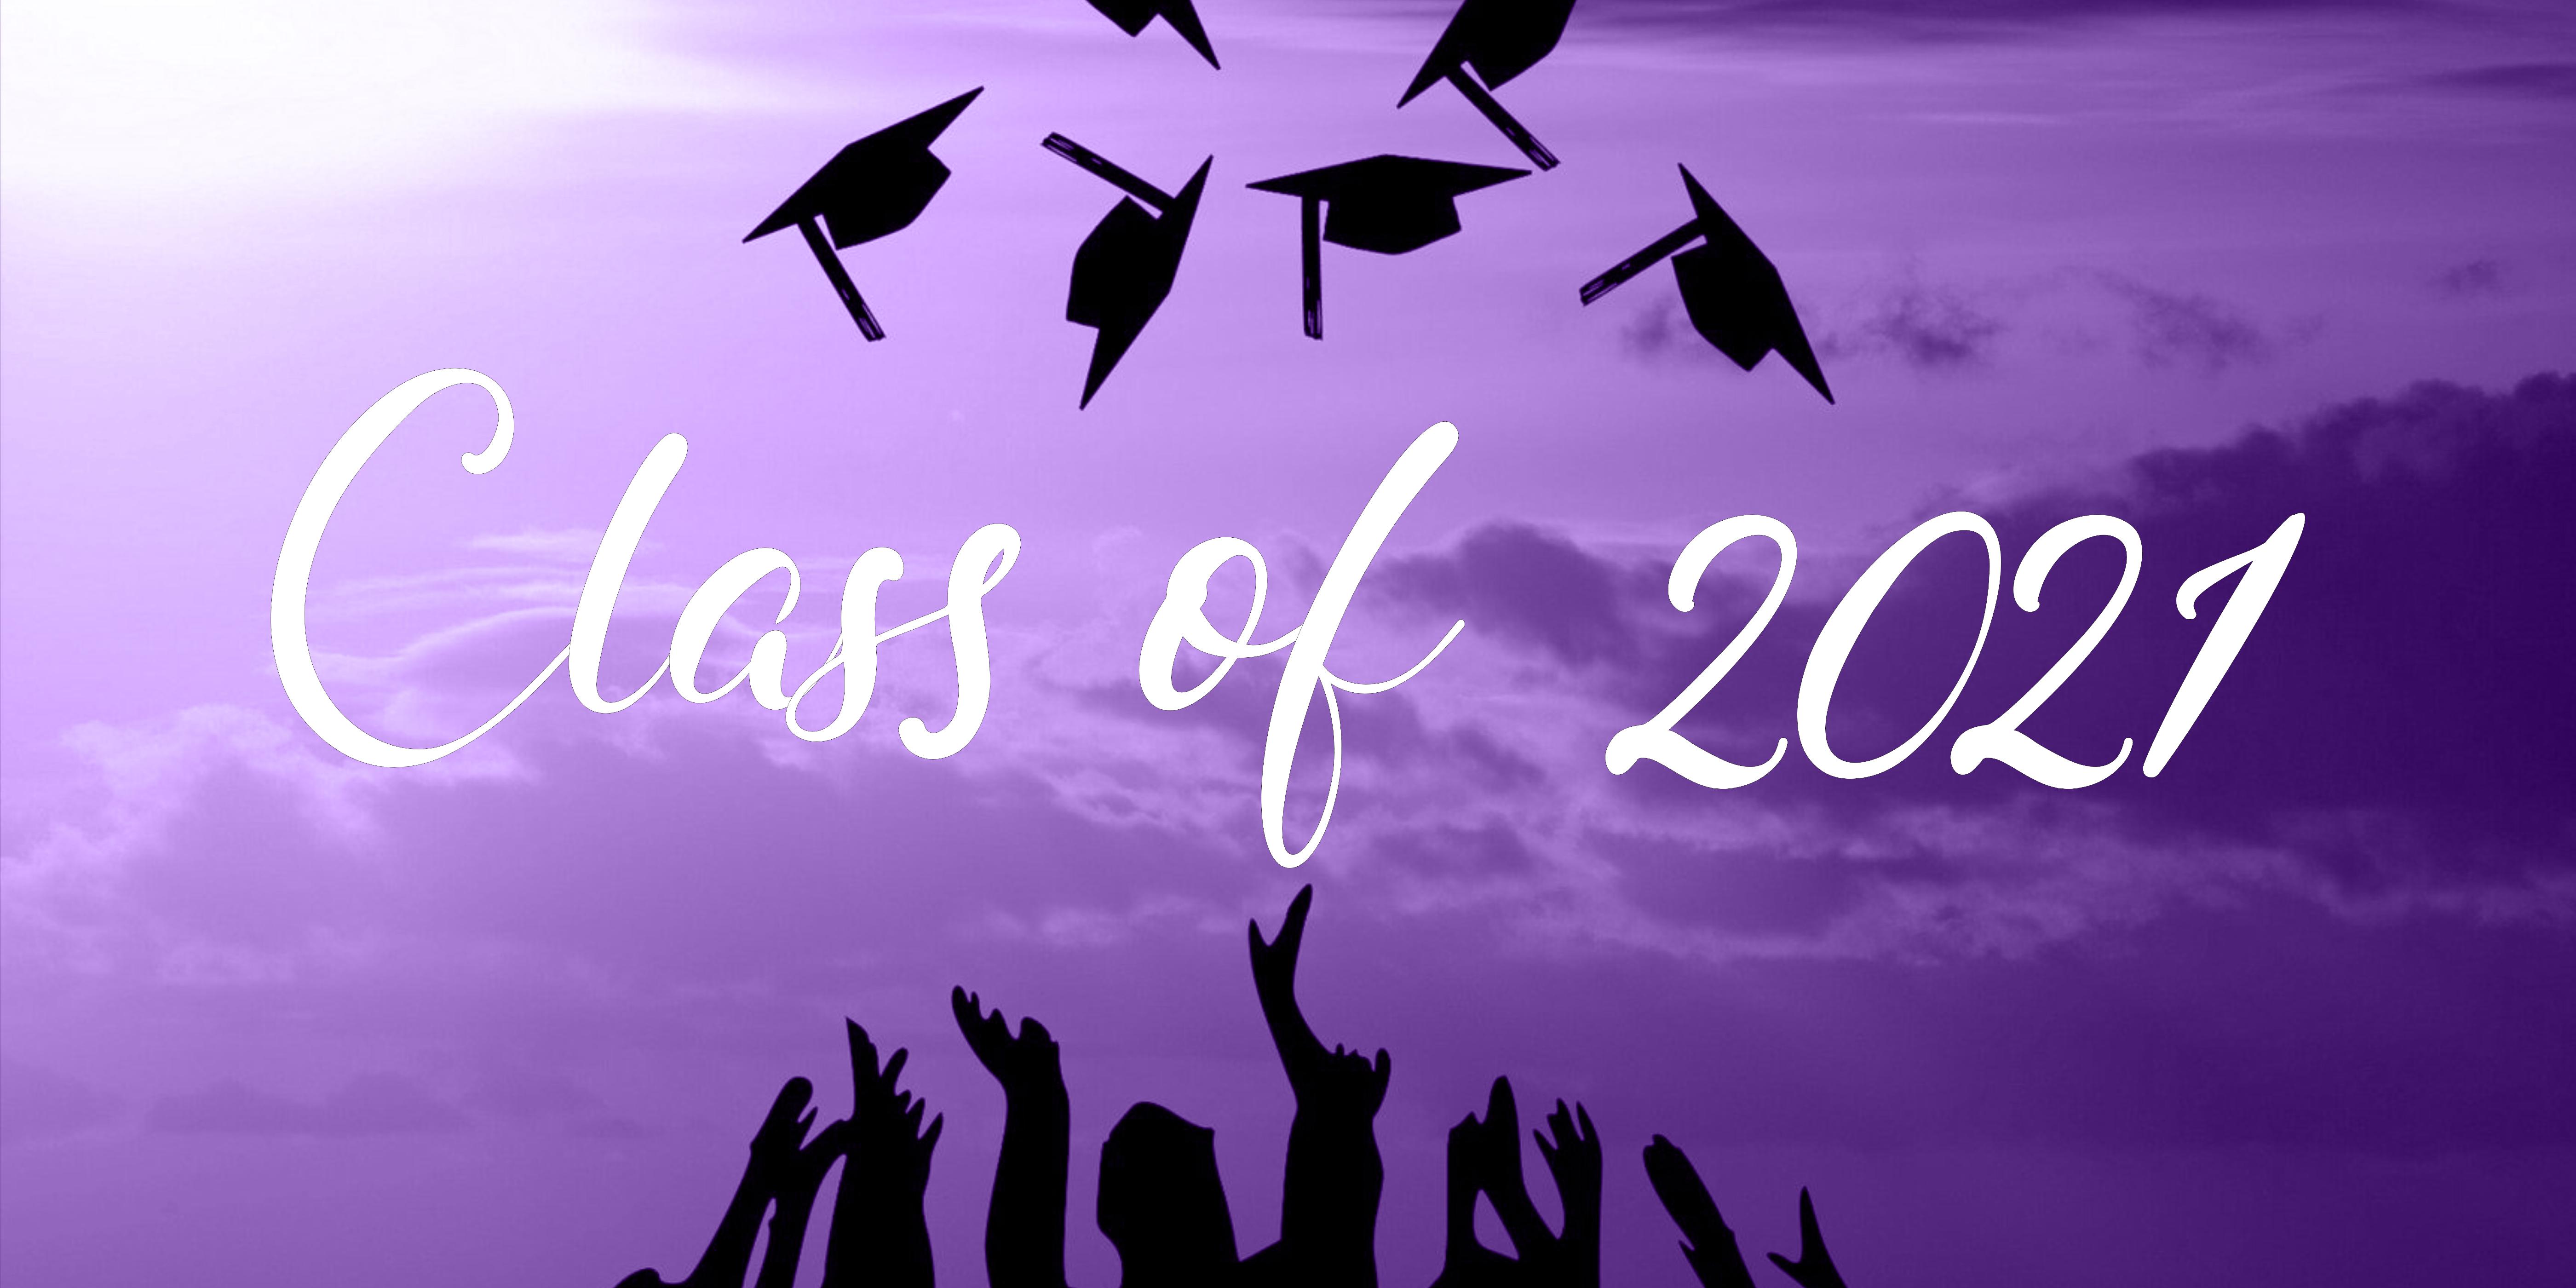 Class of 2021 Cheer!